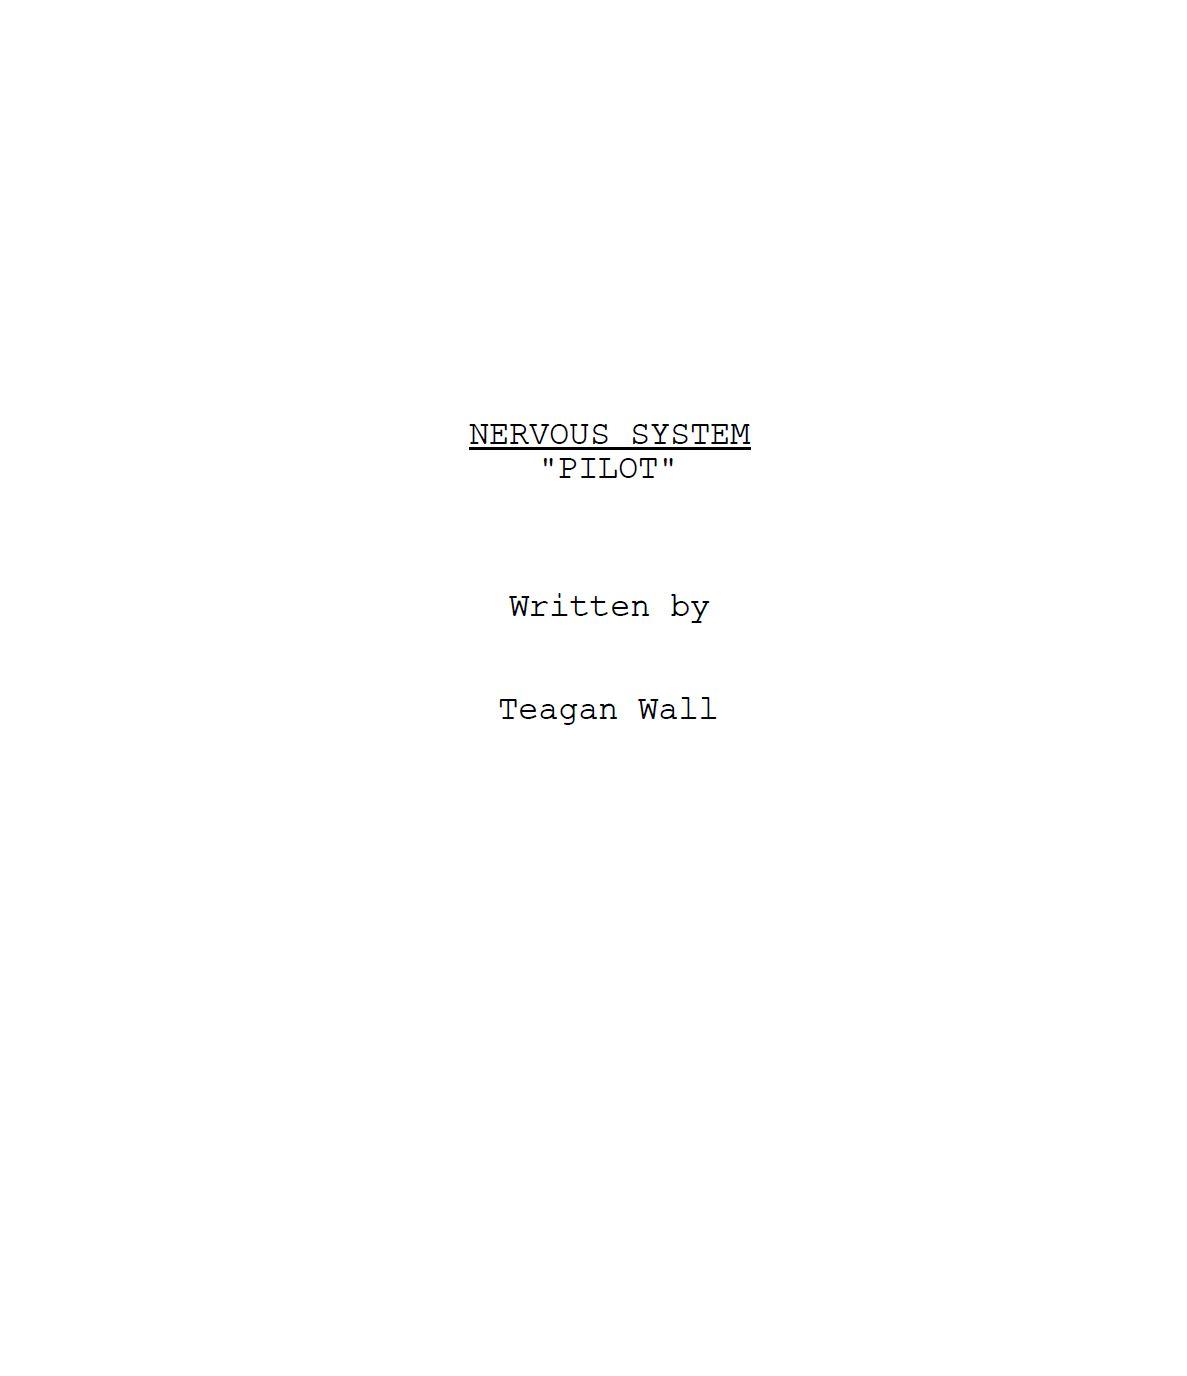 Nervous System title page.JPG